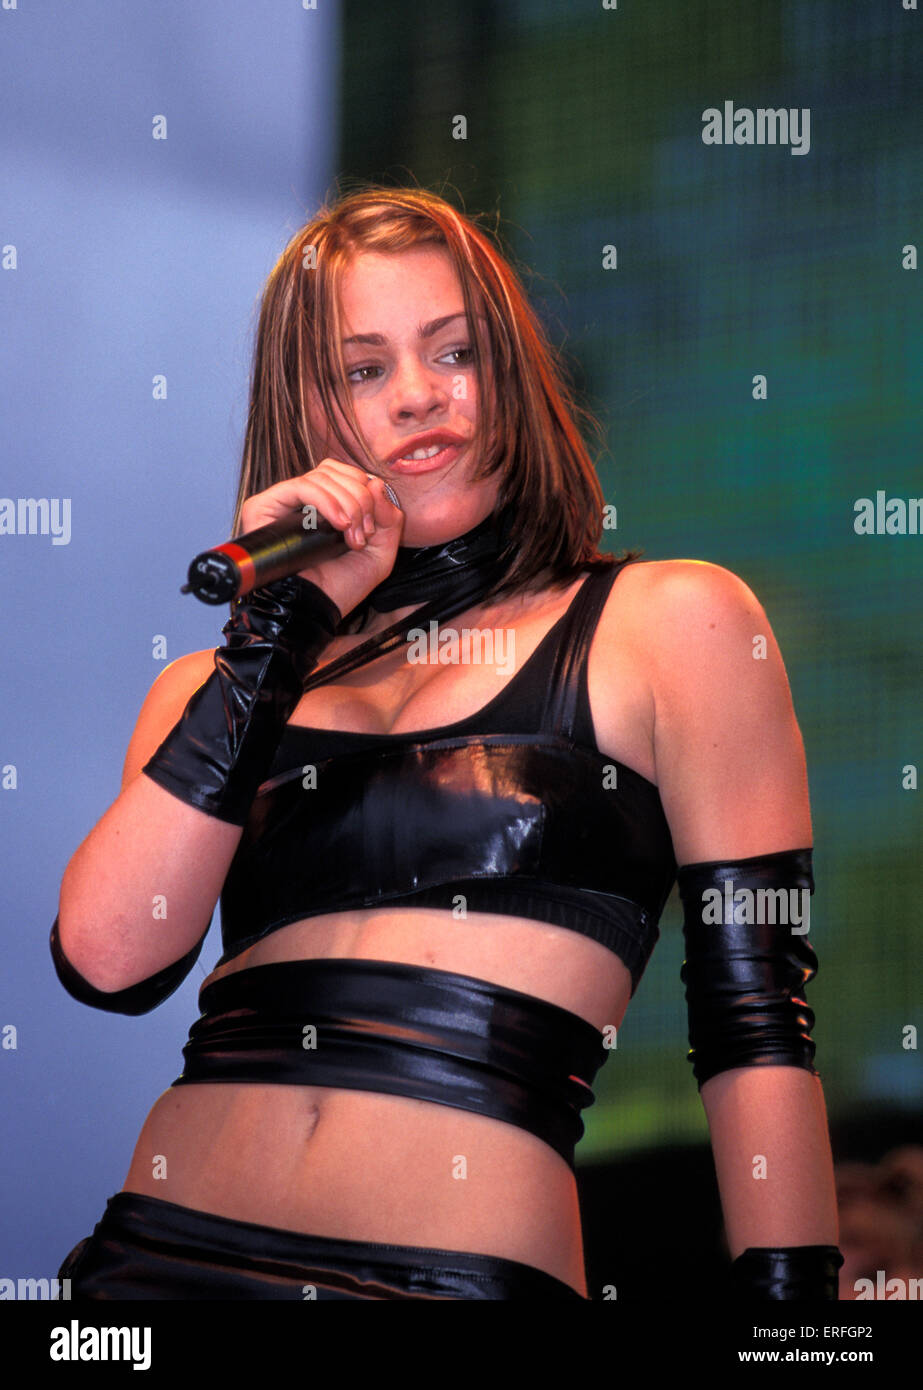 Billie Piper (born 1982) nudes (81 foto) Video, YouTube, cleavage